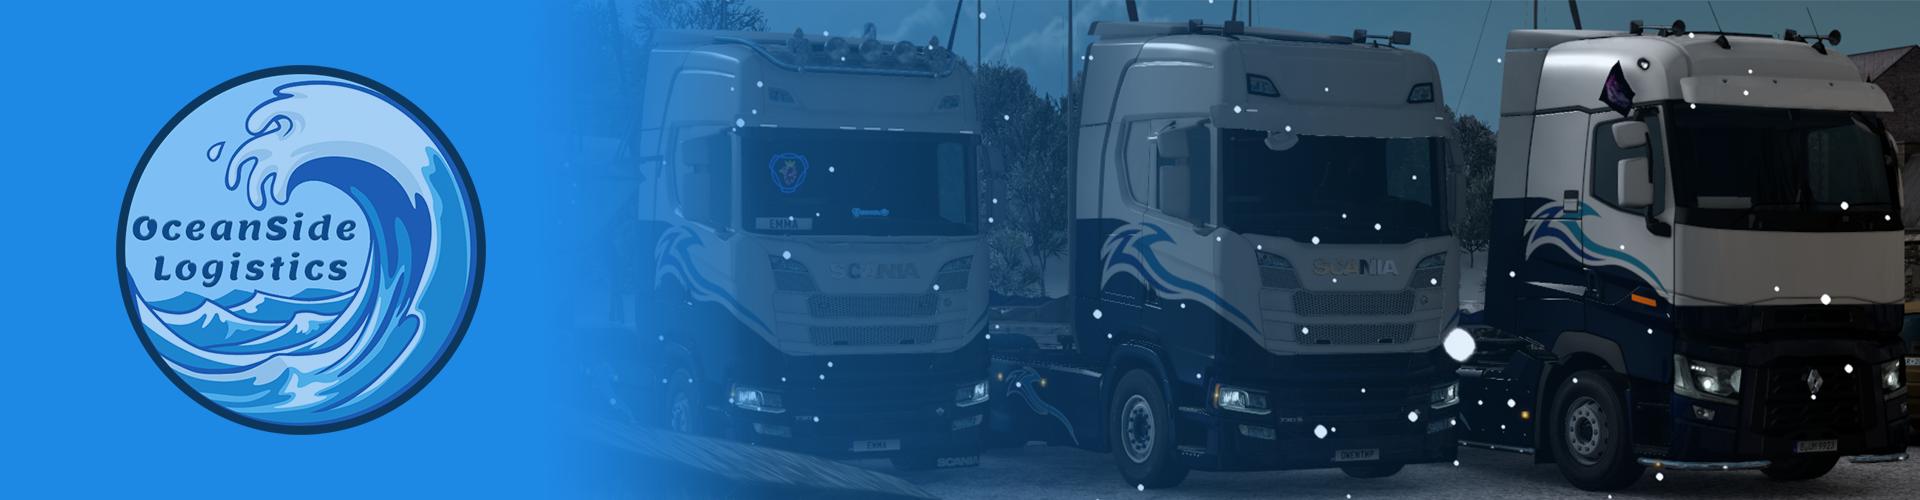 🌊 OceanSide Logistics October Convoy